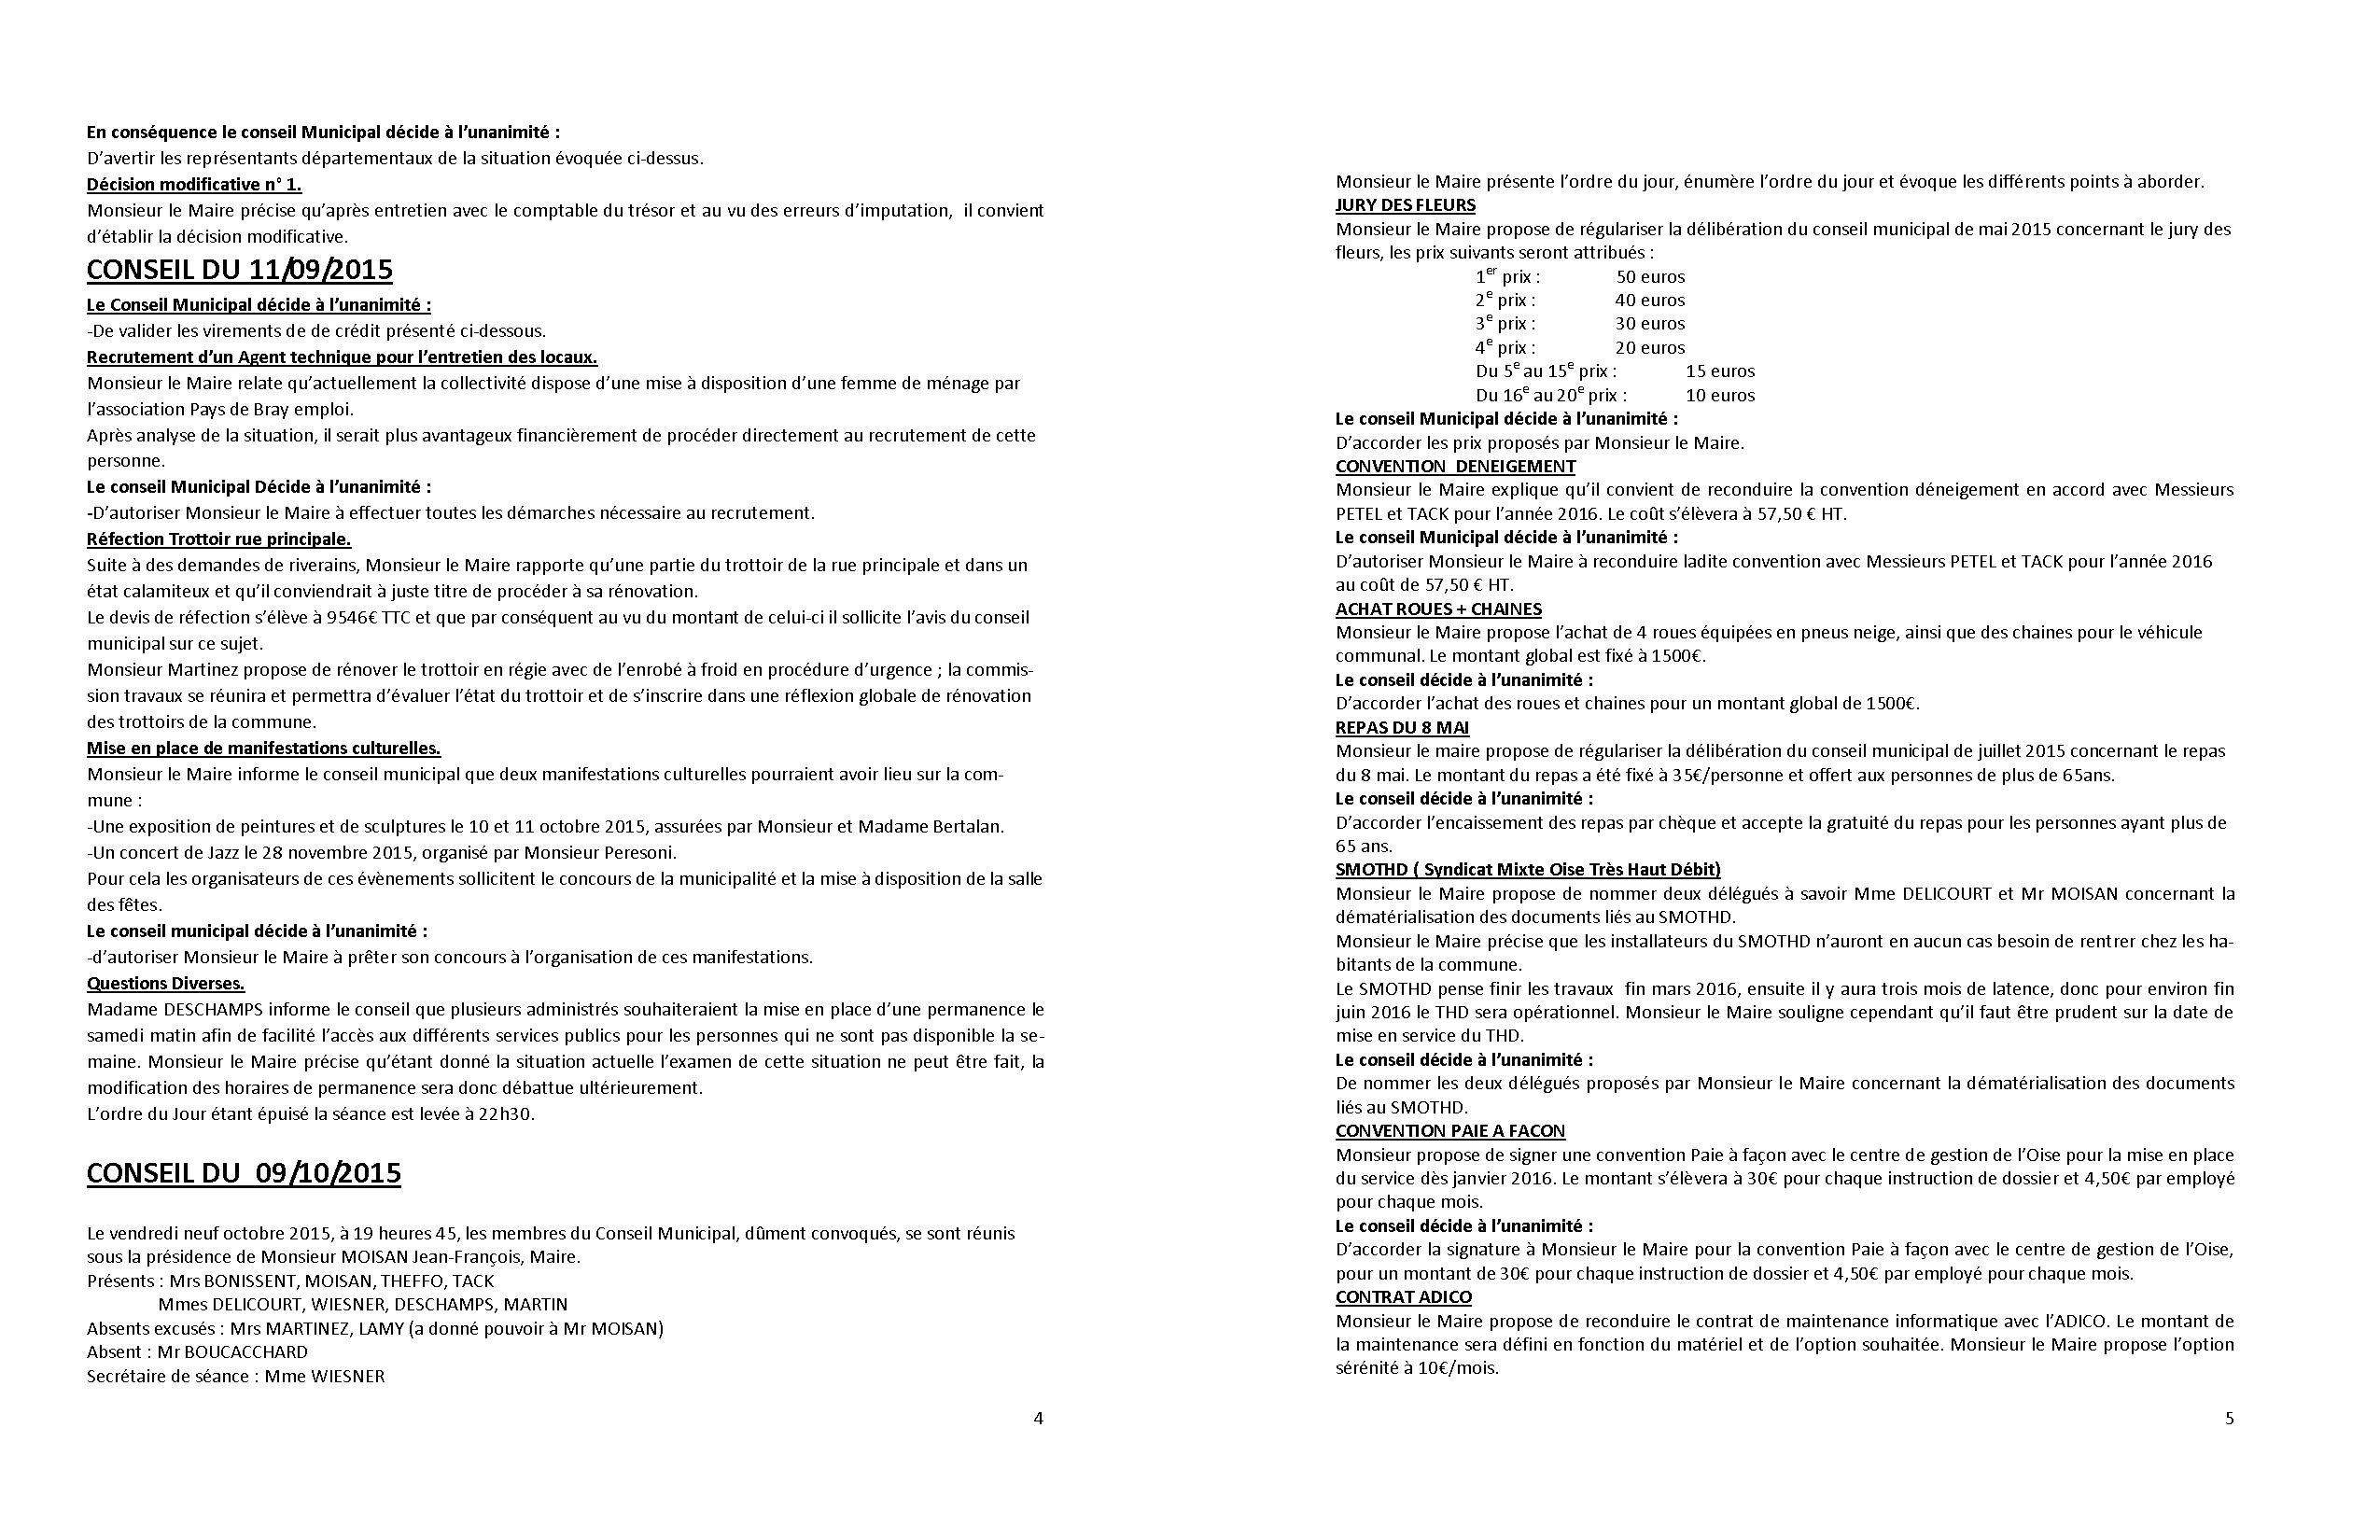 petit-journal-dec-15-4-5